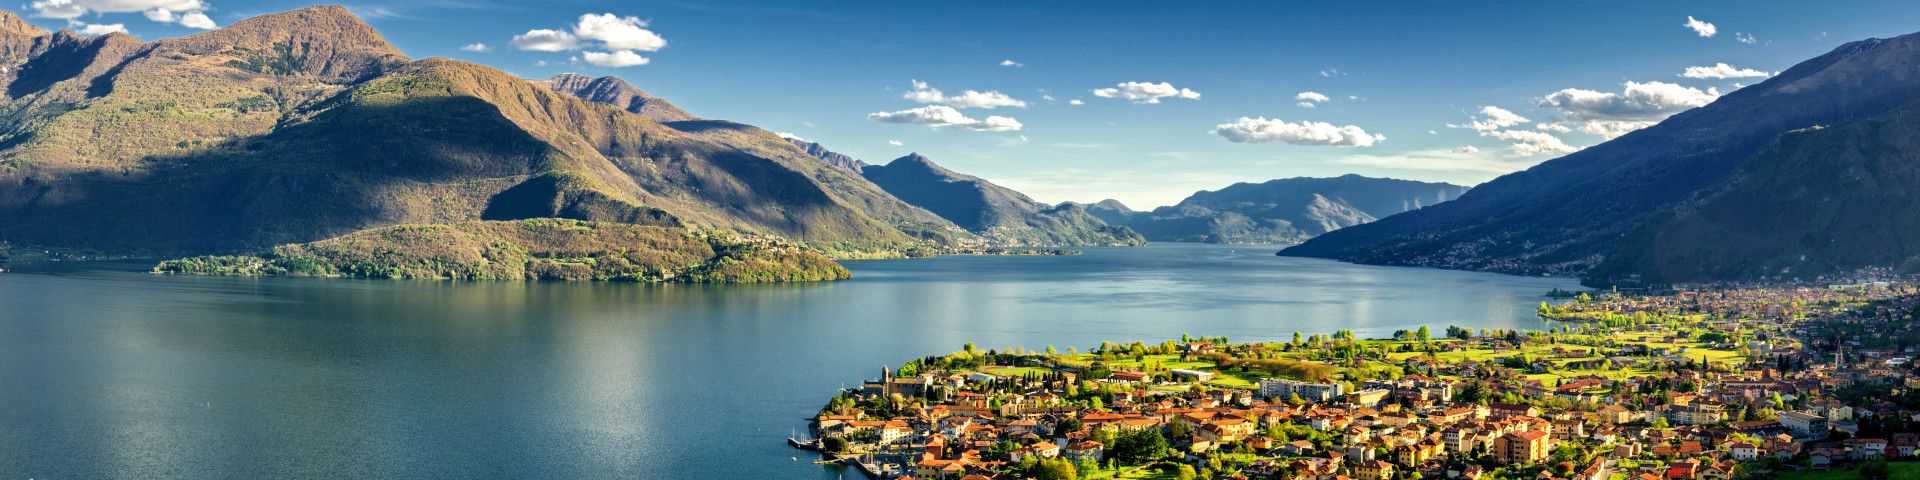 pohled na městečko Gravedona a Lago di Como